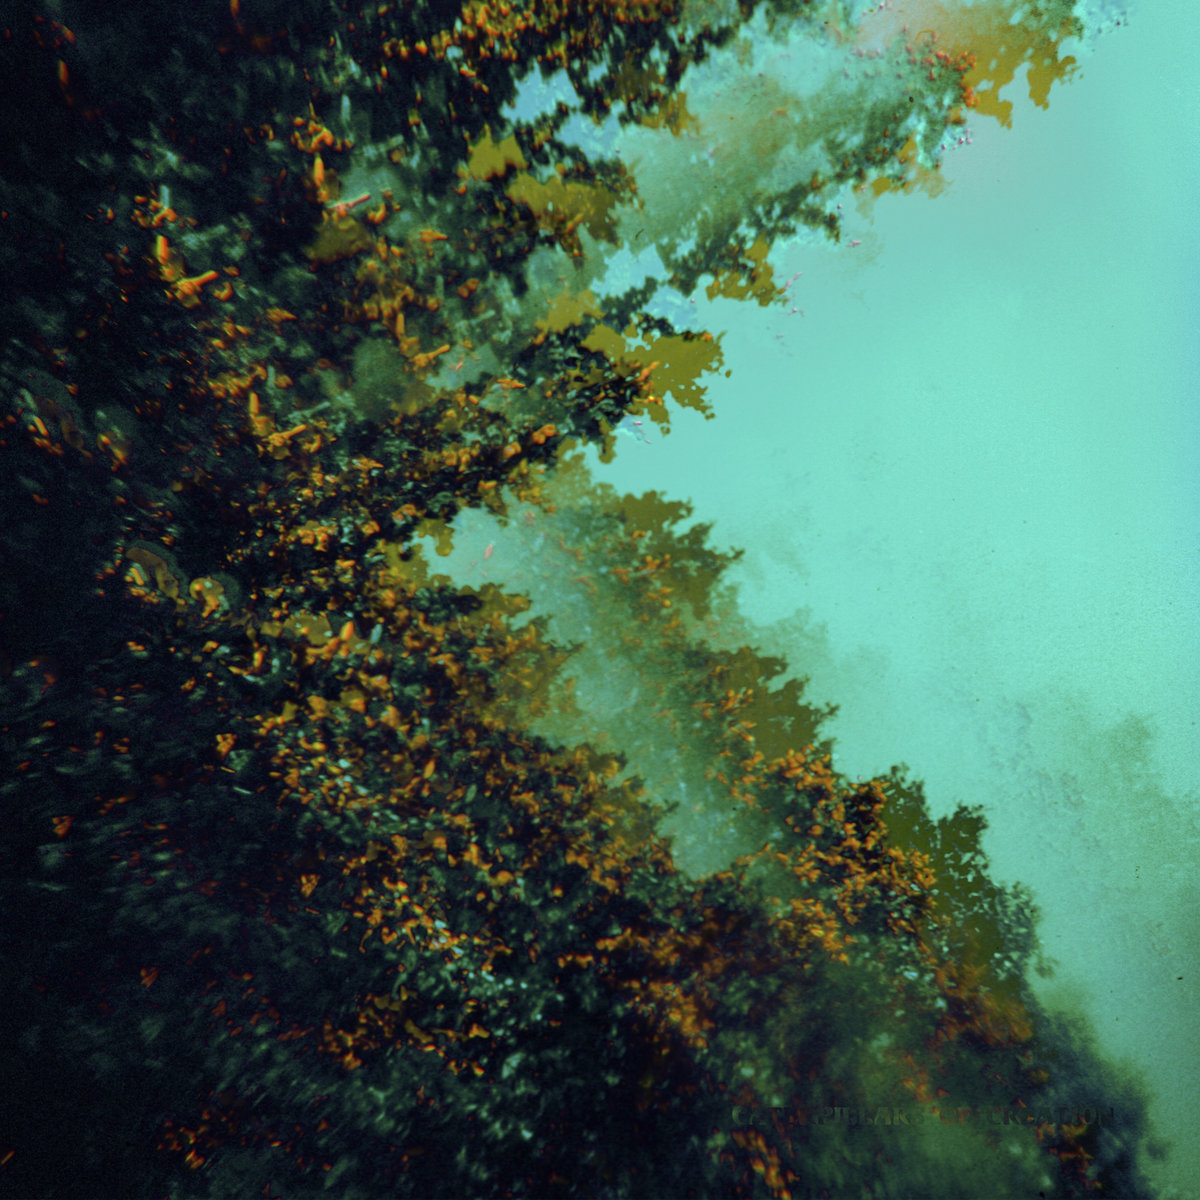 11-Polymoon - caterpillars of creation